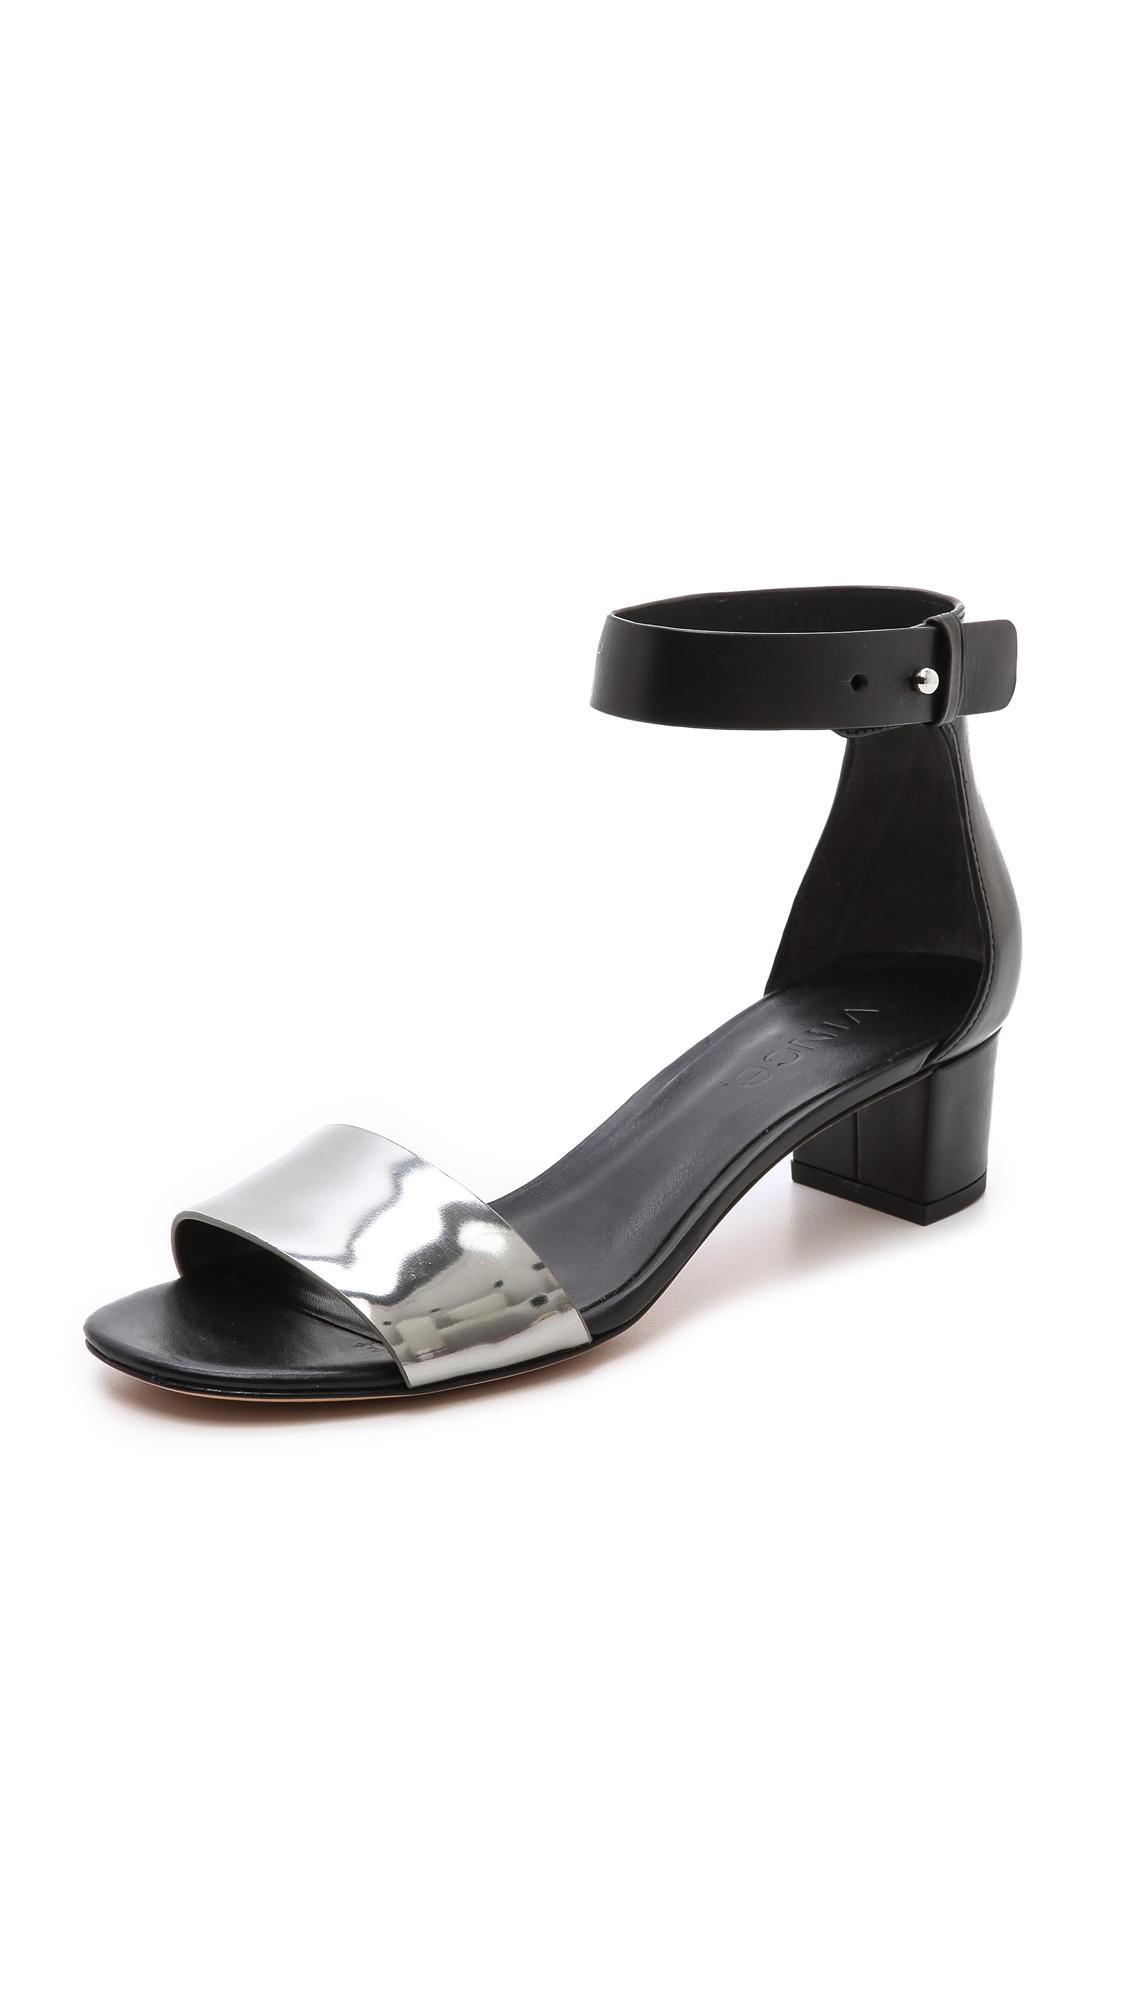 Black sandals ultima online - Black Heel Sandals Pictures